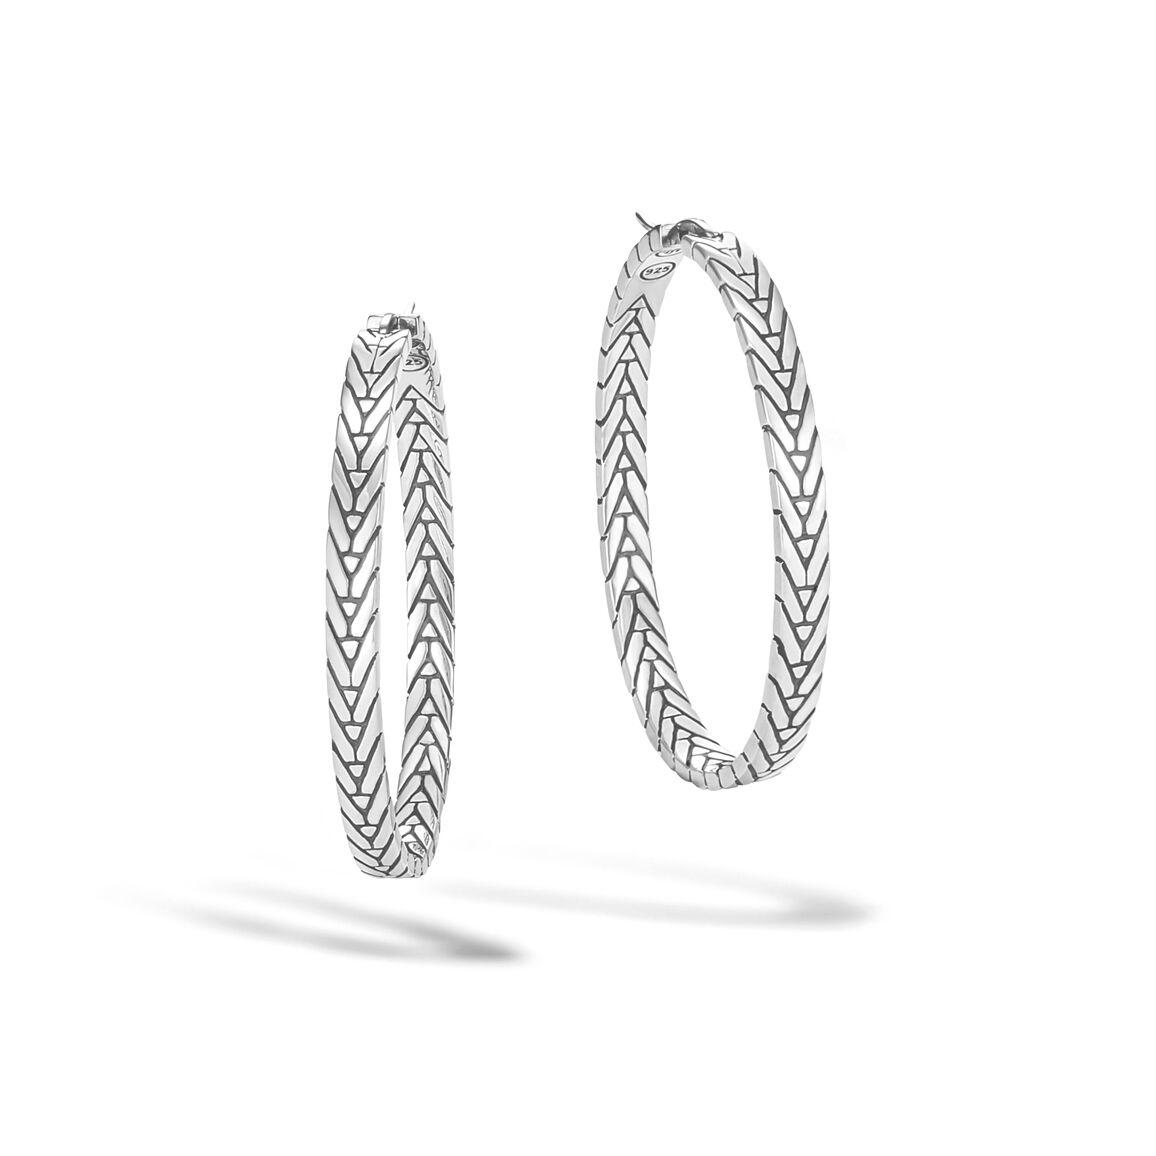 Modern Chain Medium Hoop Earring in Silver